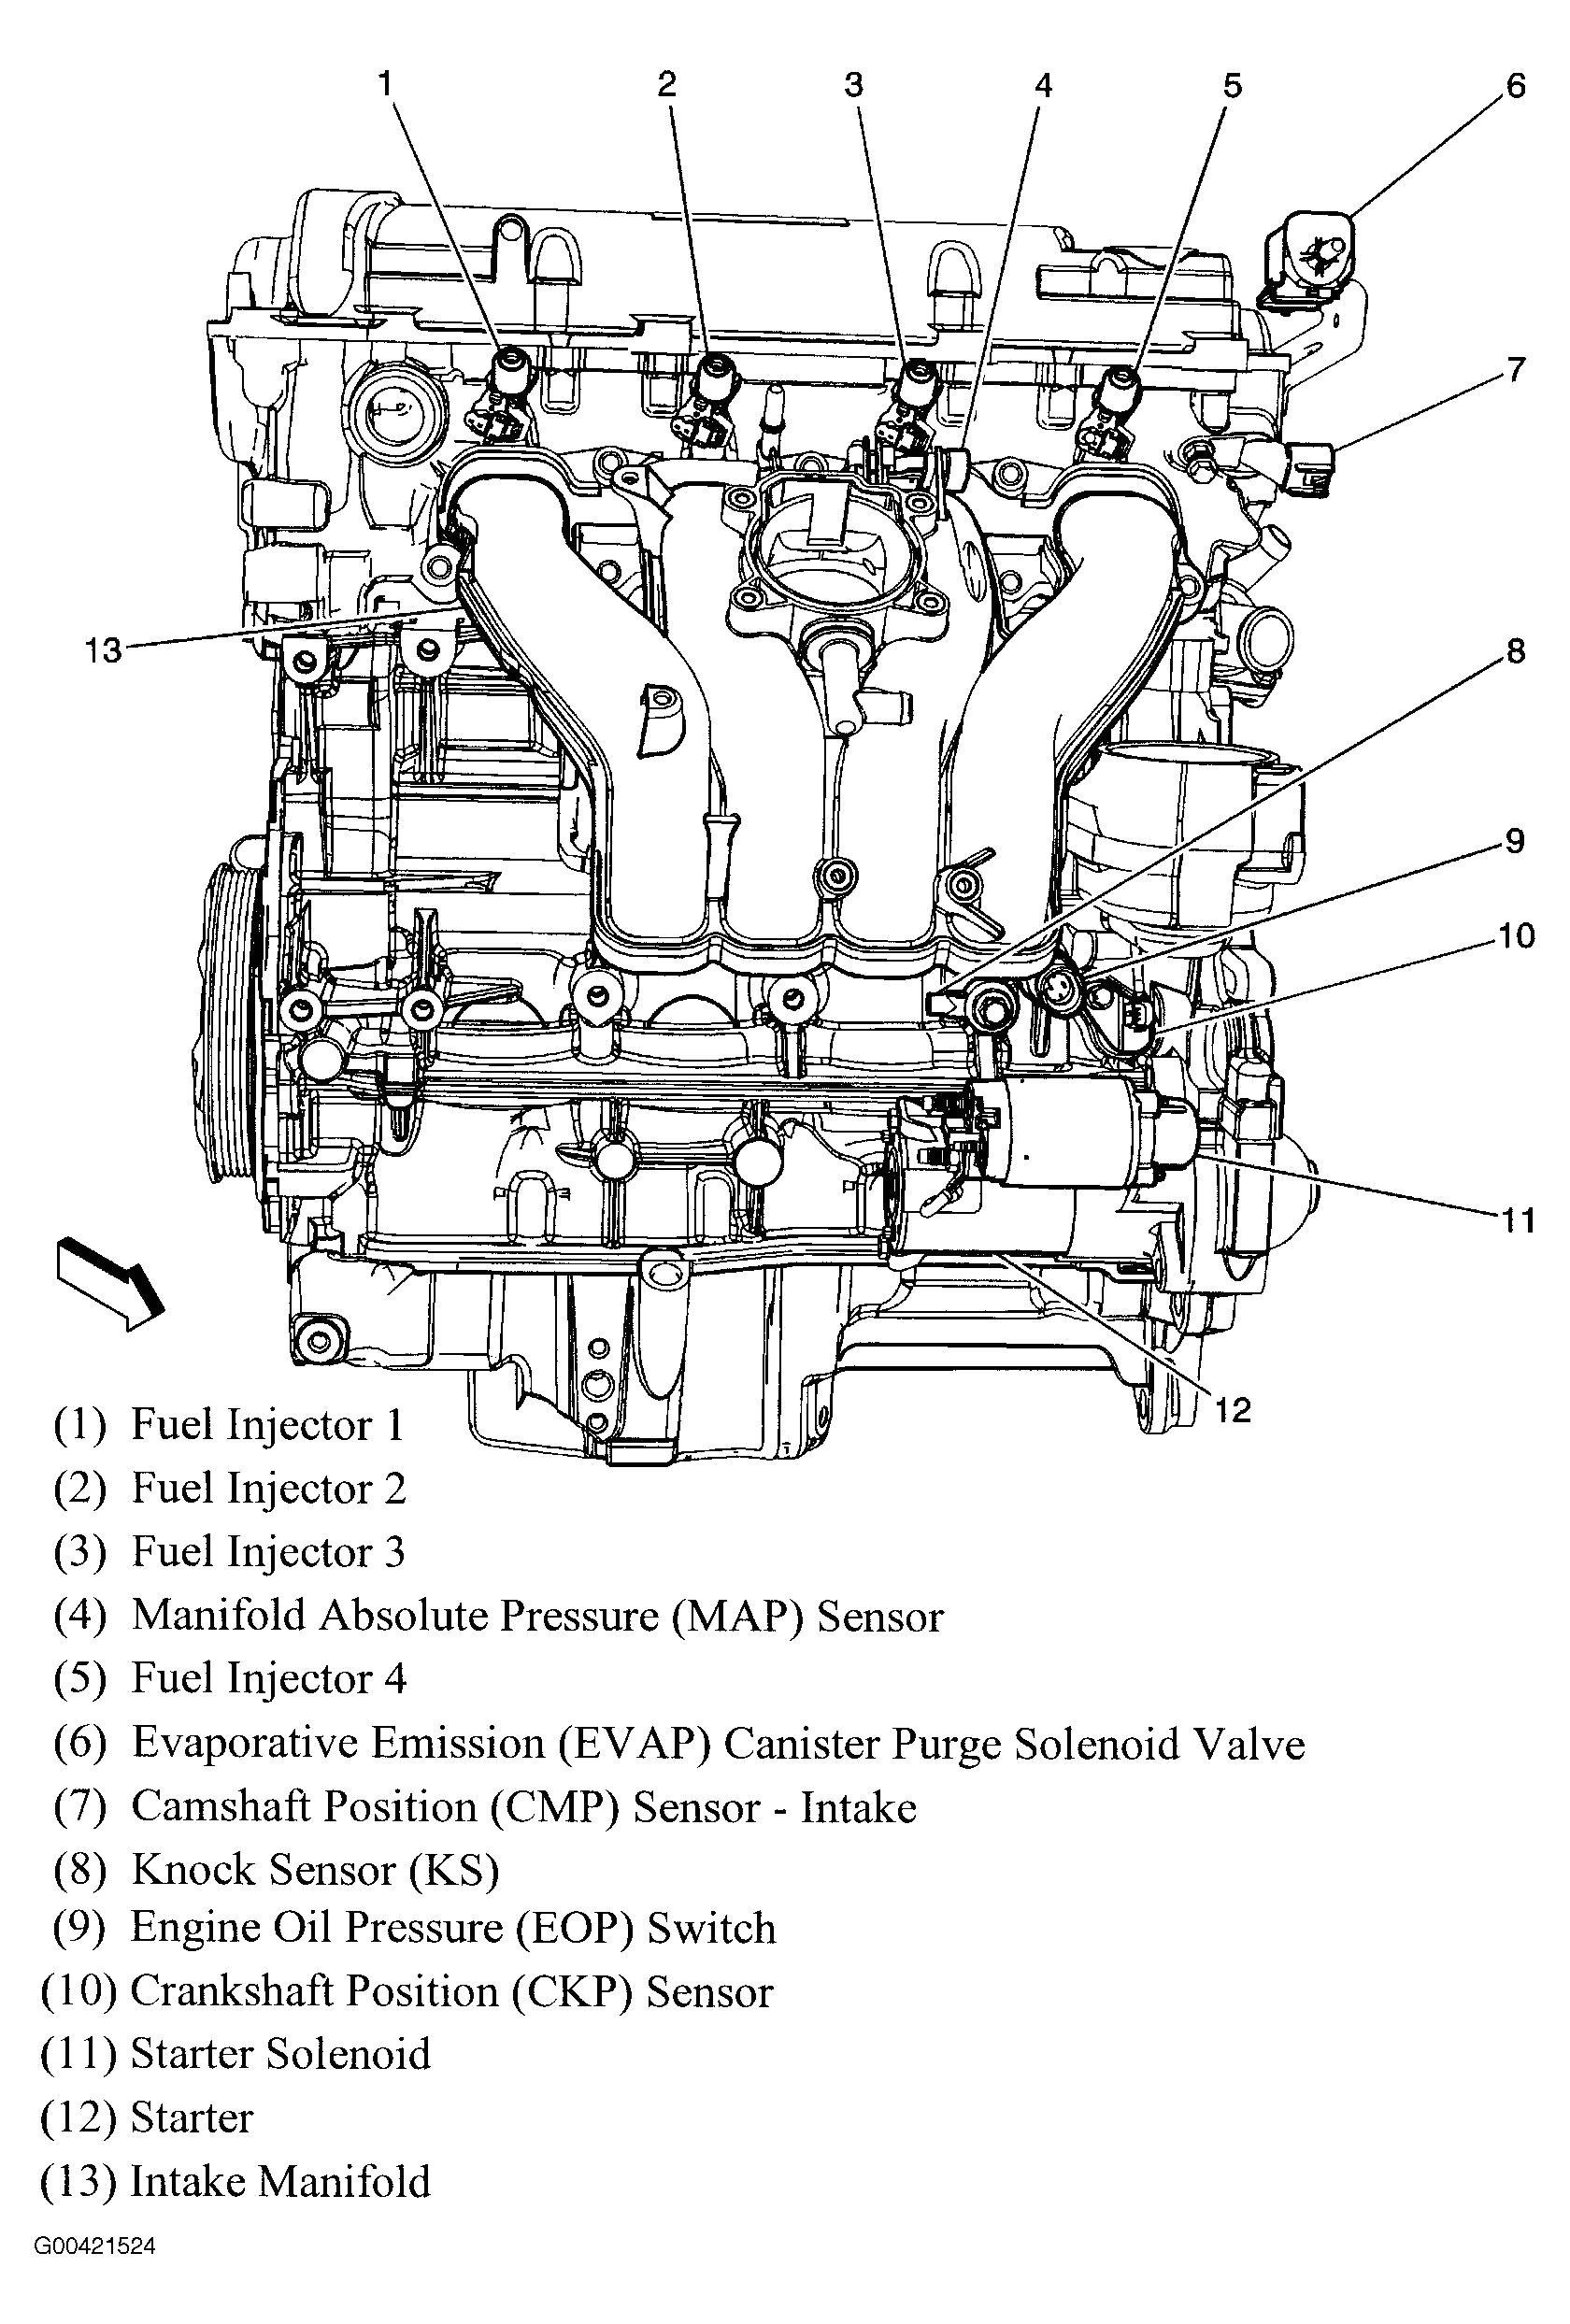 hyundai 3 5 engine diagram wiring diagram pos 2007 hyundai santa fe v6 map sensor wiring diagram